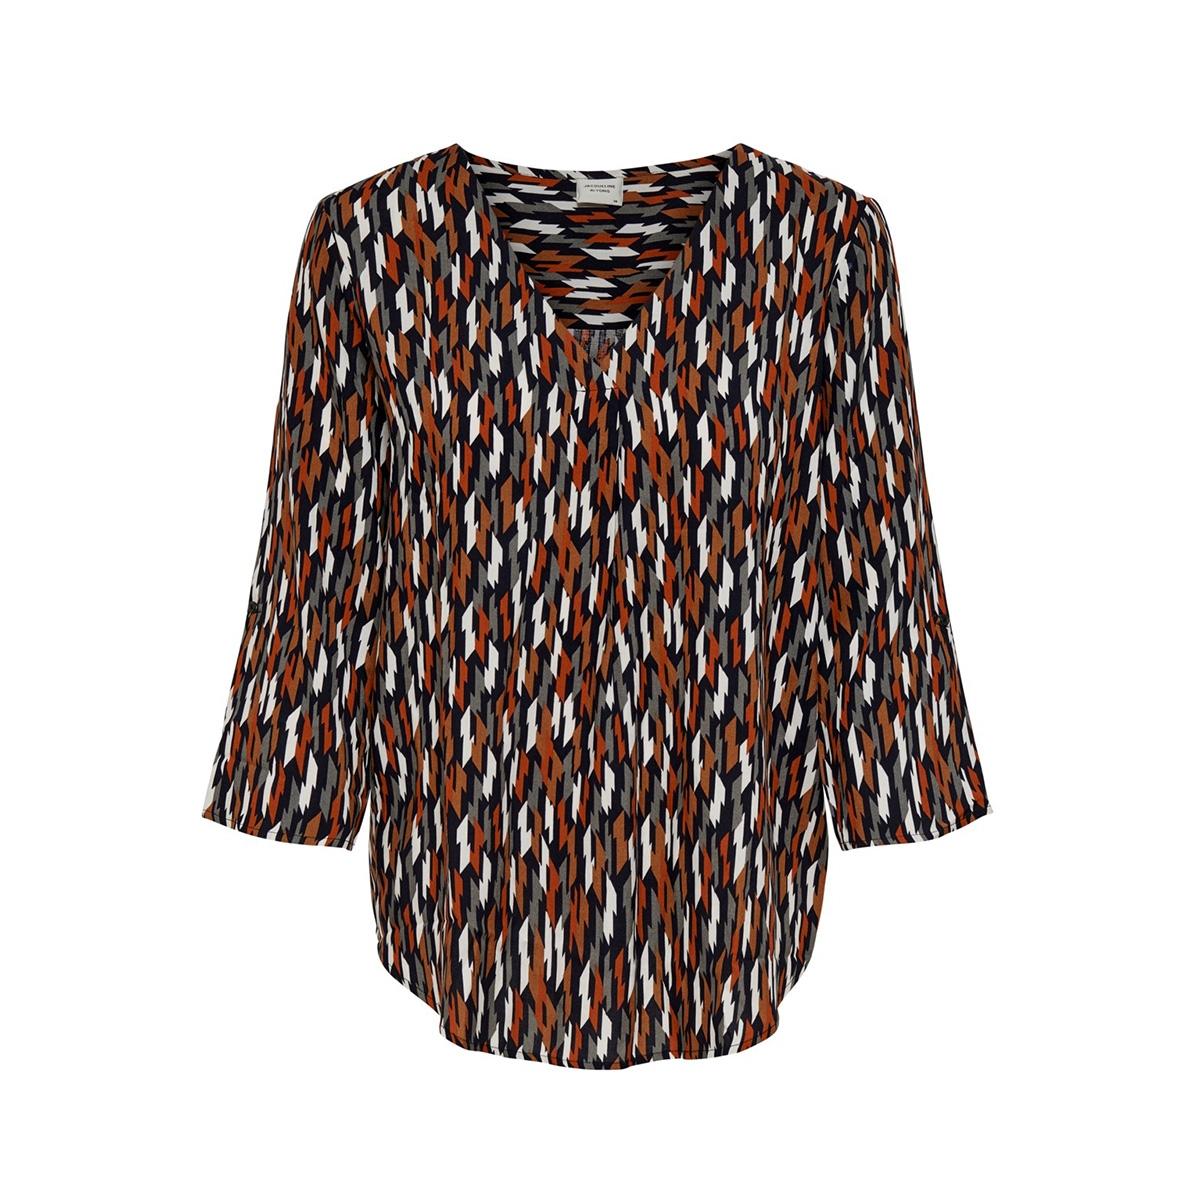 jdypeak 3/4 top wvn 15189902 jacqueline de yong blouse black/geometric